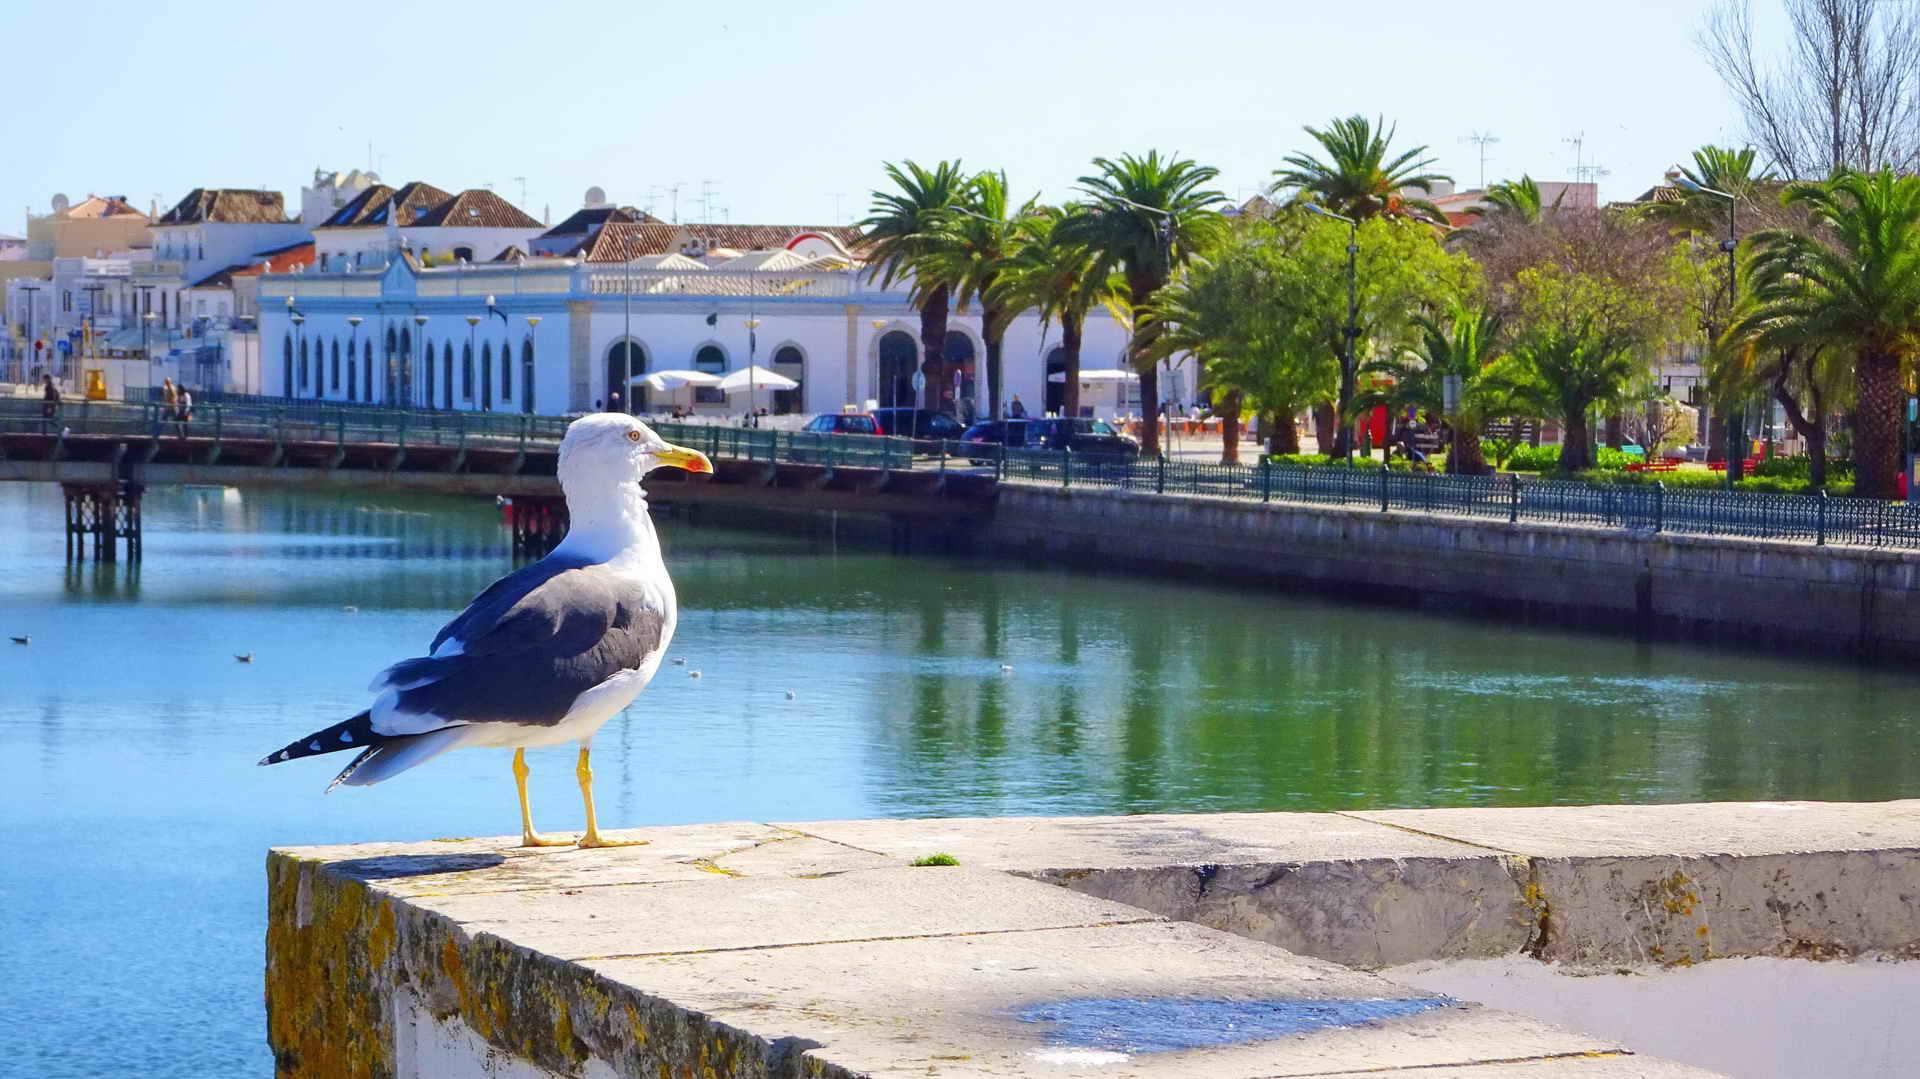 Portugal Bike Tours in Financial Times Town of Tavira, Biking in Portugal